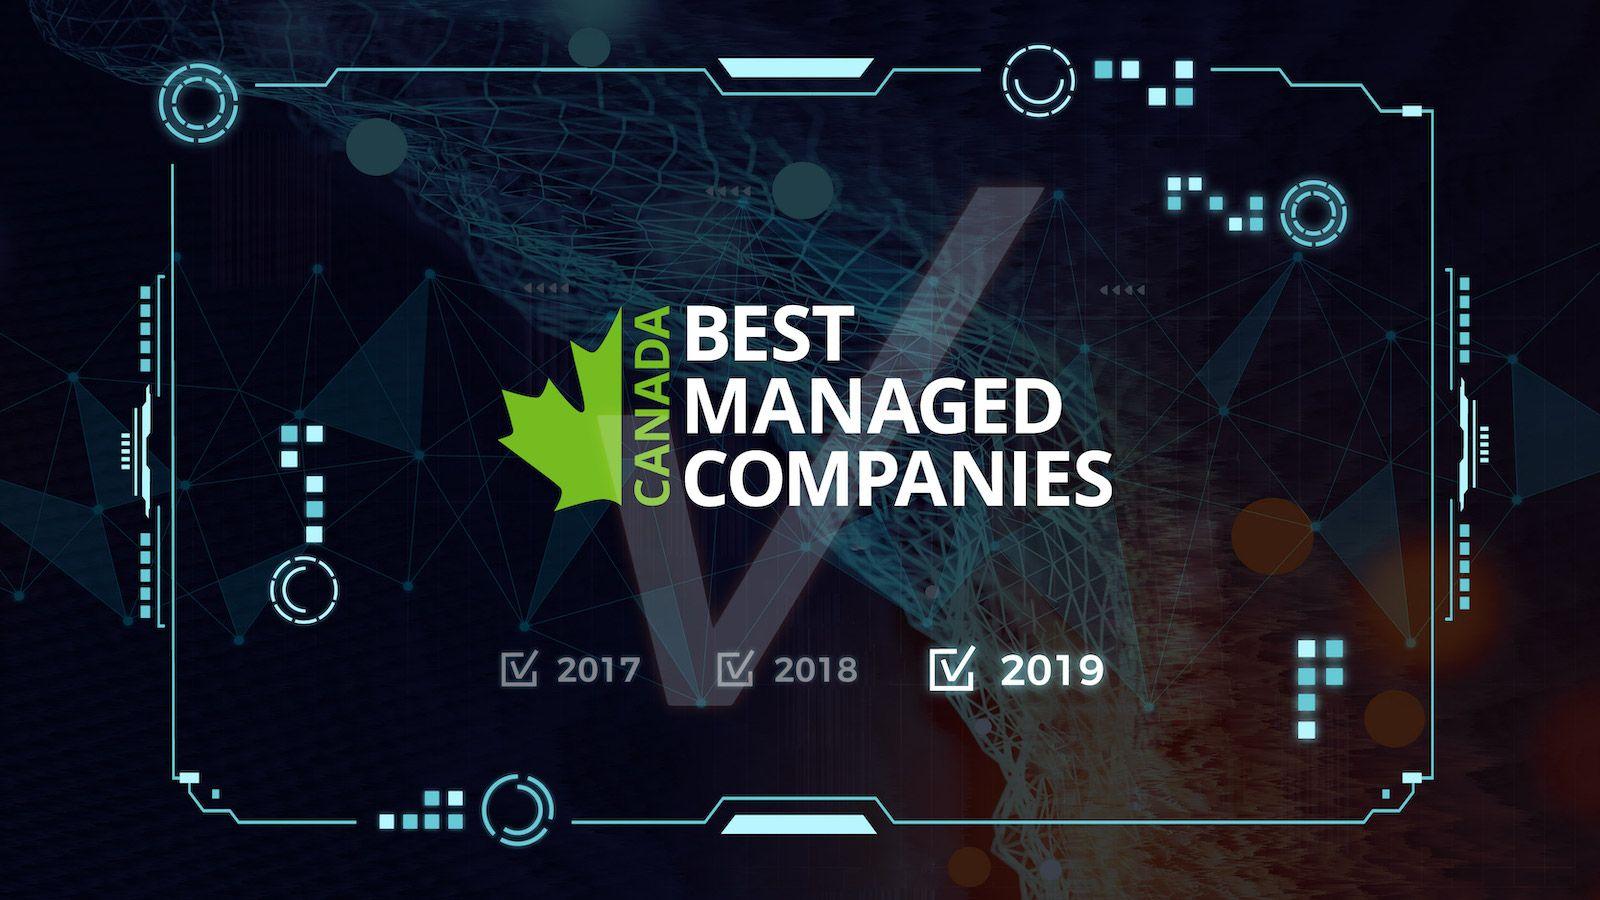 Canada Best Managed Companies award logo 2017-2019